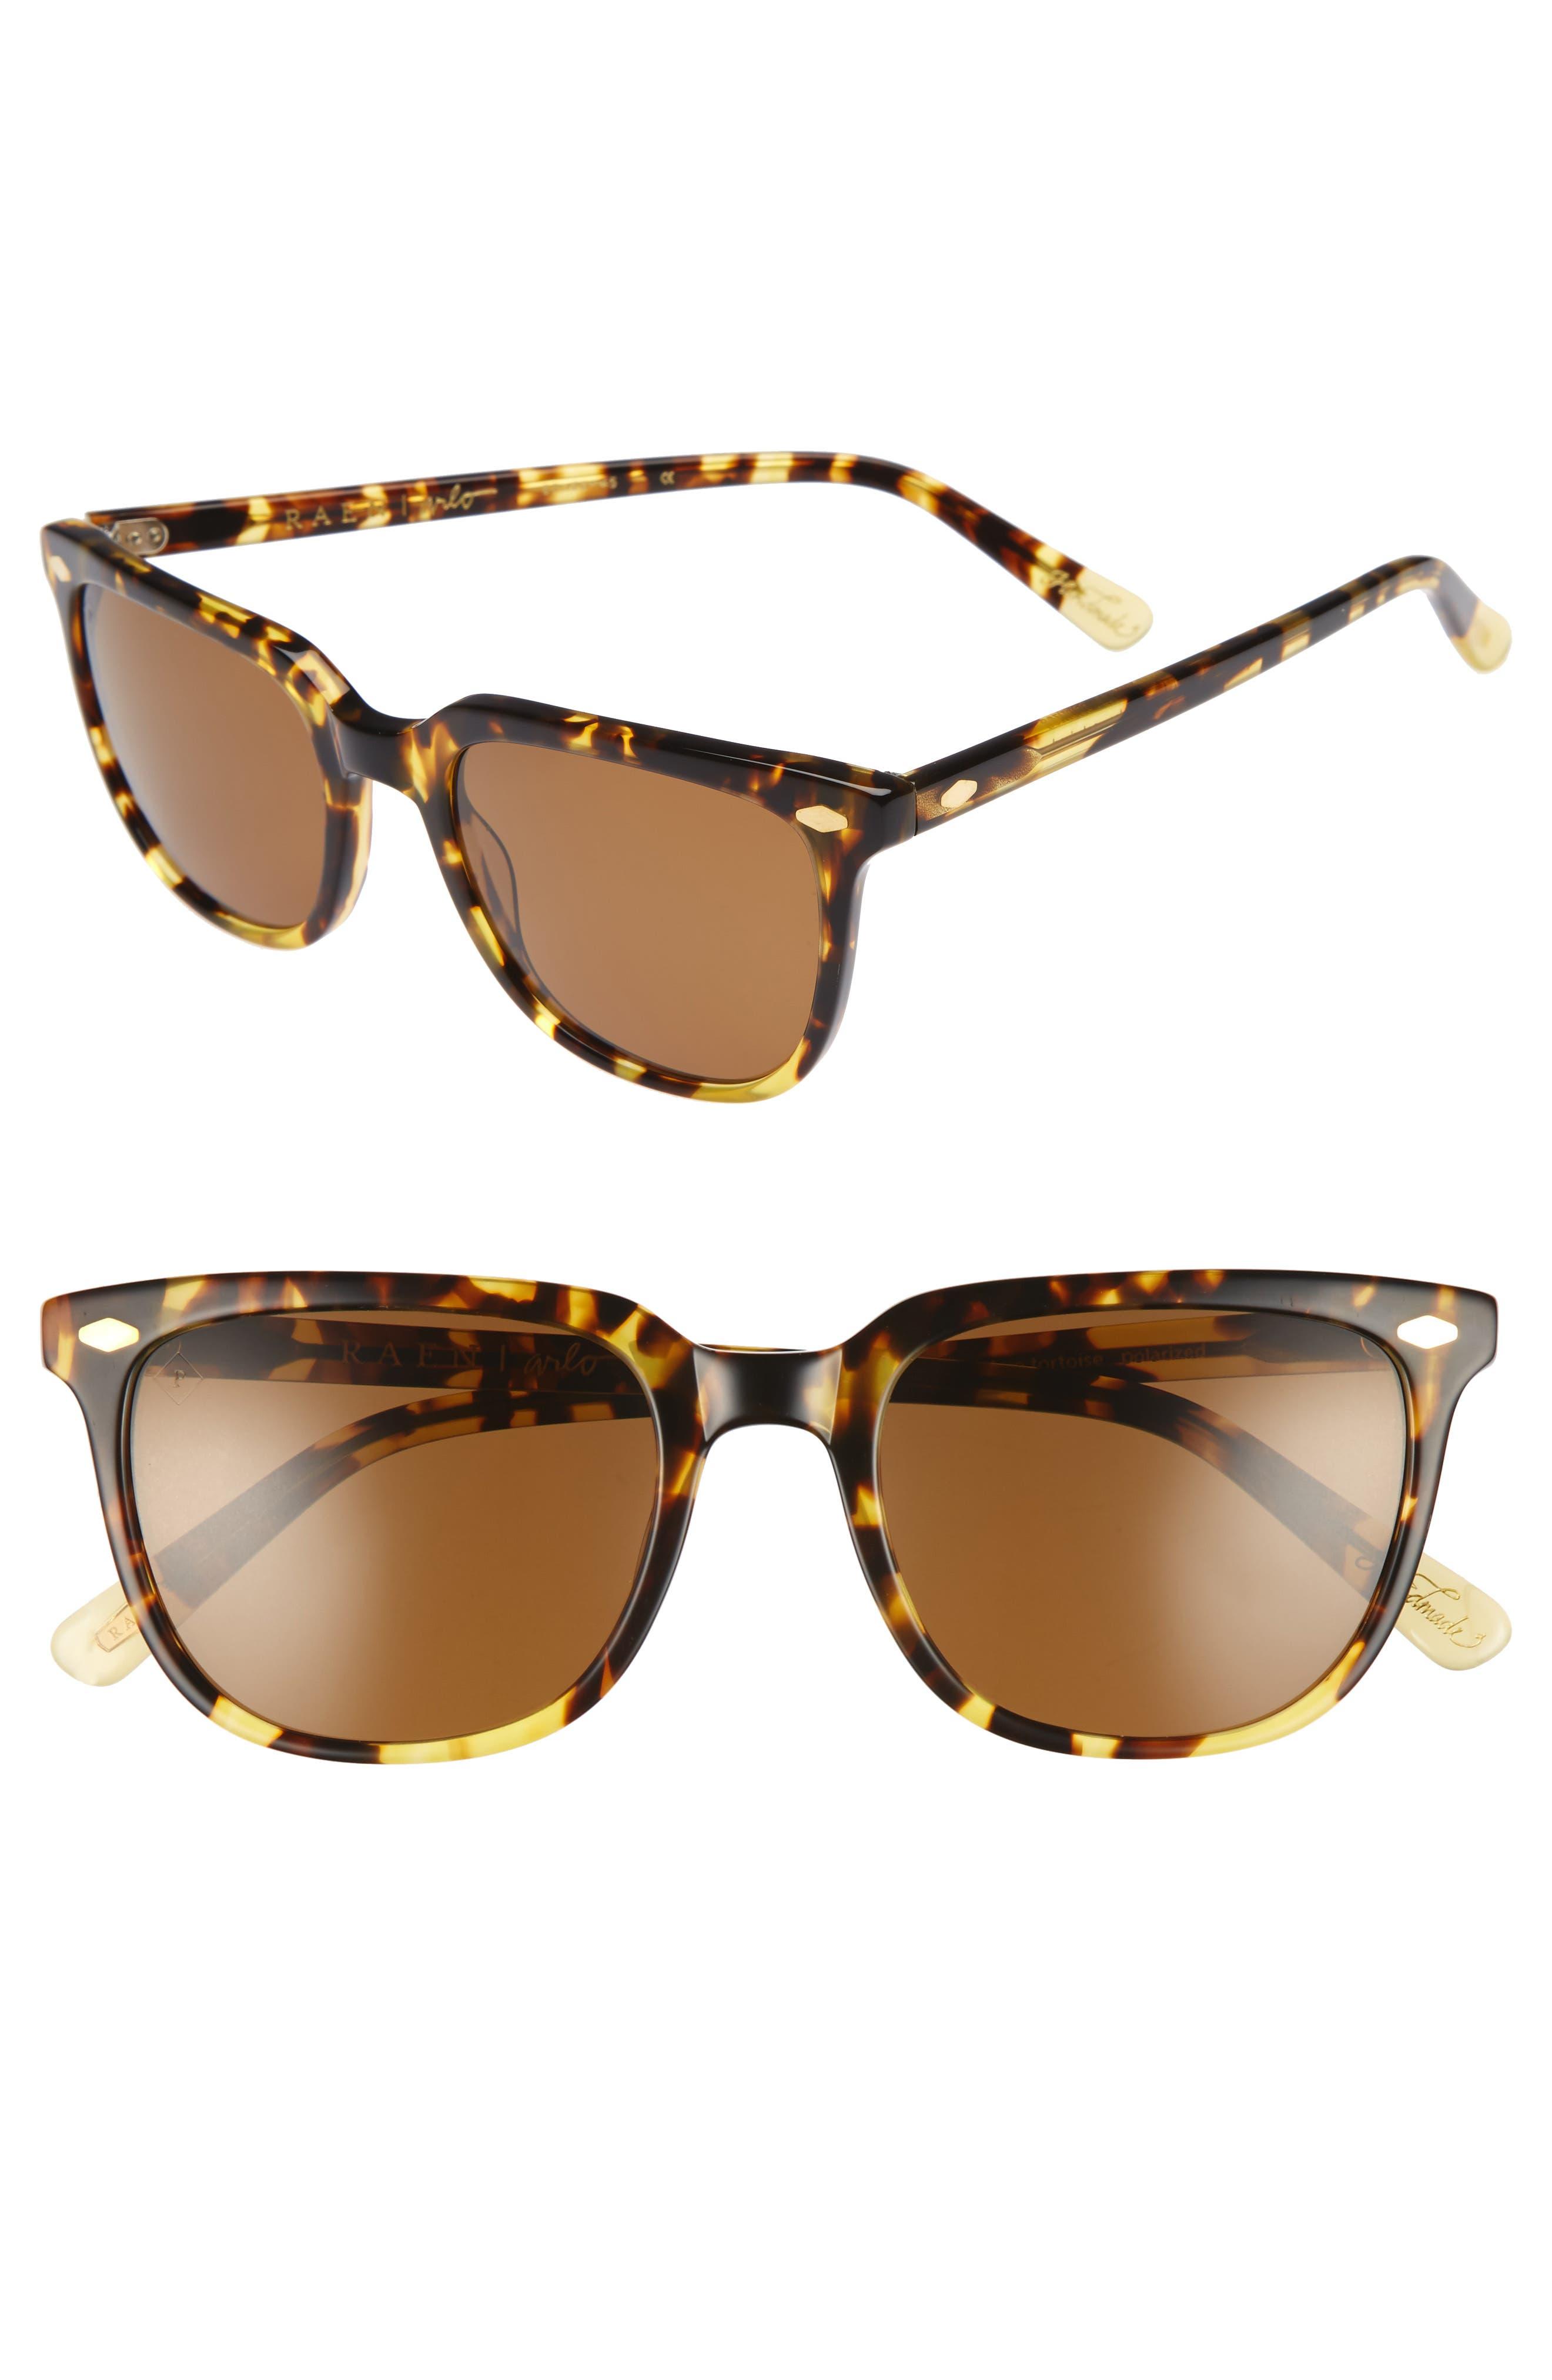 Arlo 53mm Polarized Sunglasses,                             Main thumbnail 1, color,                             TOKYO TORTOISE/ BROWN